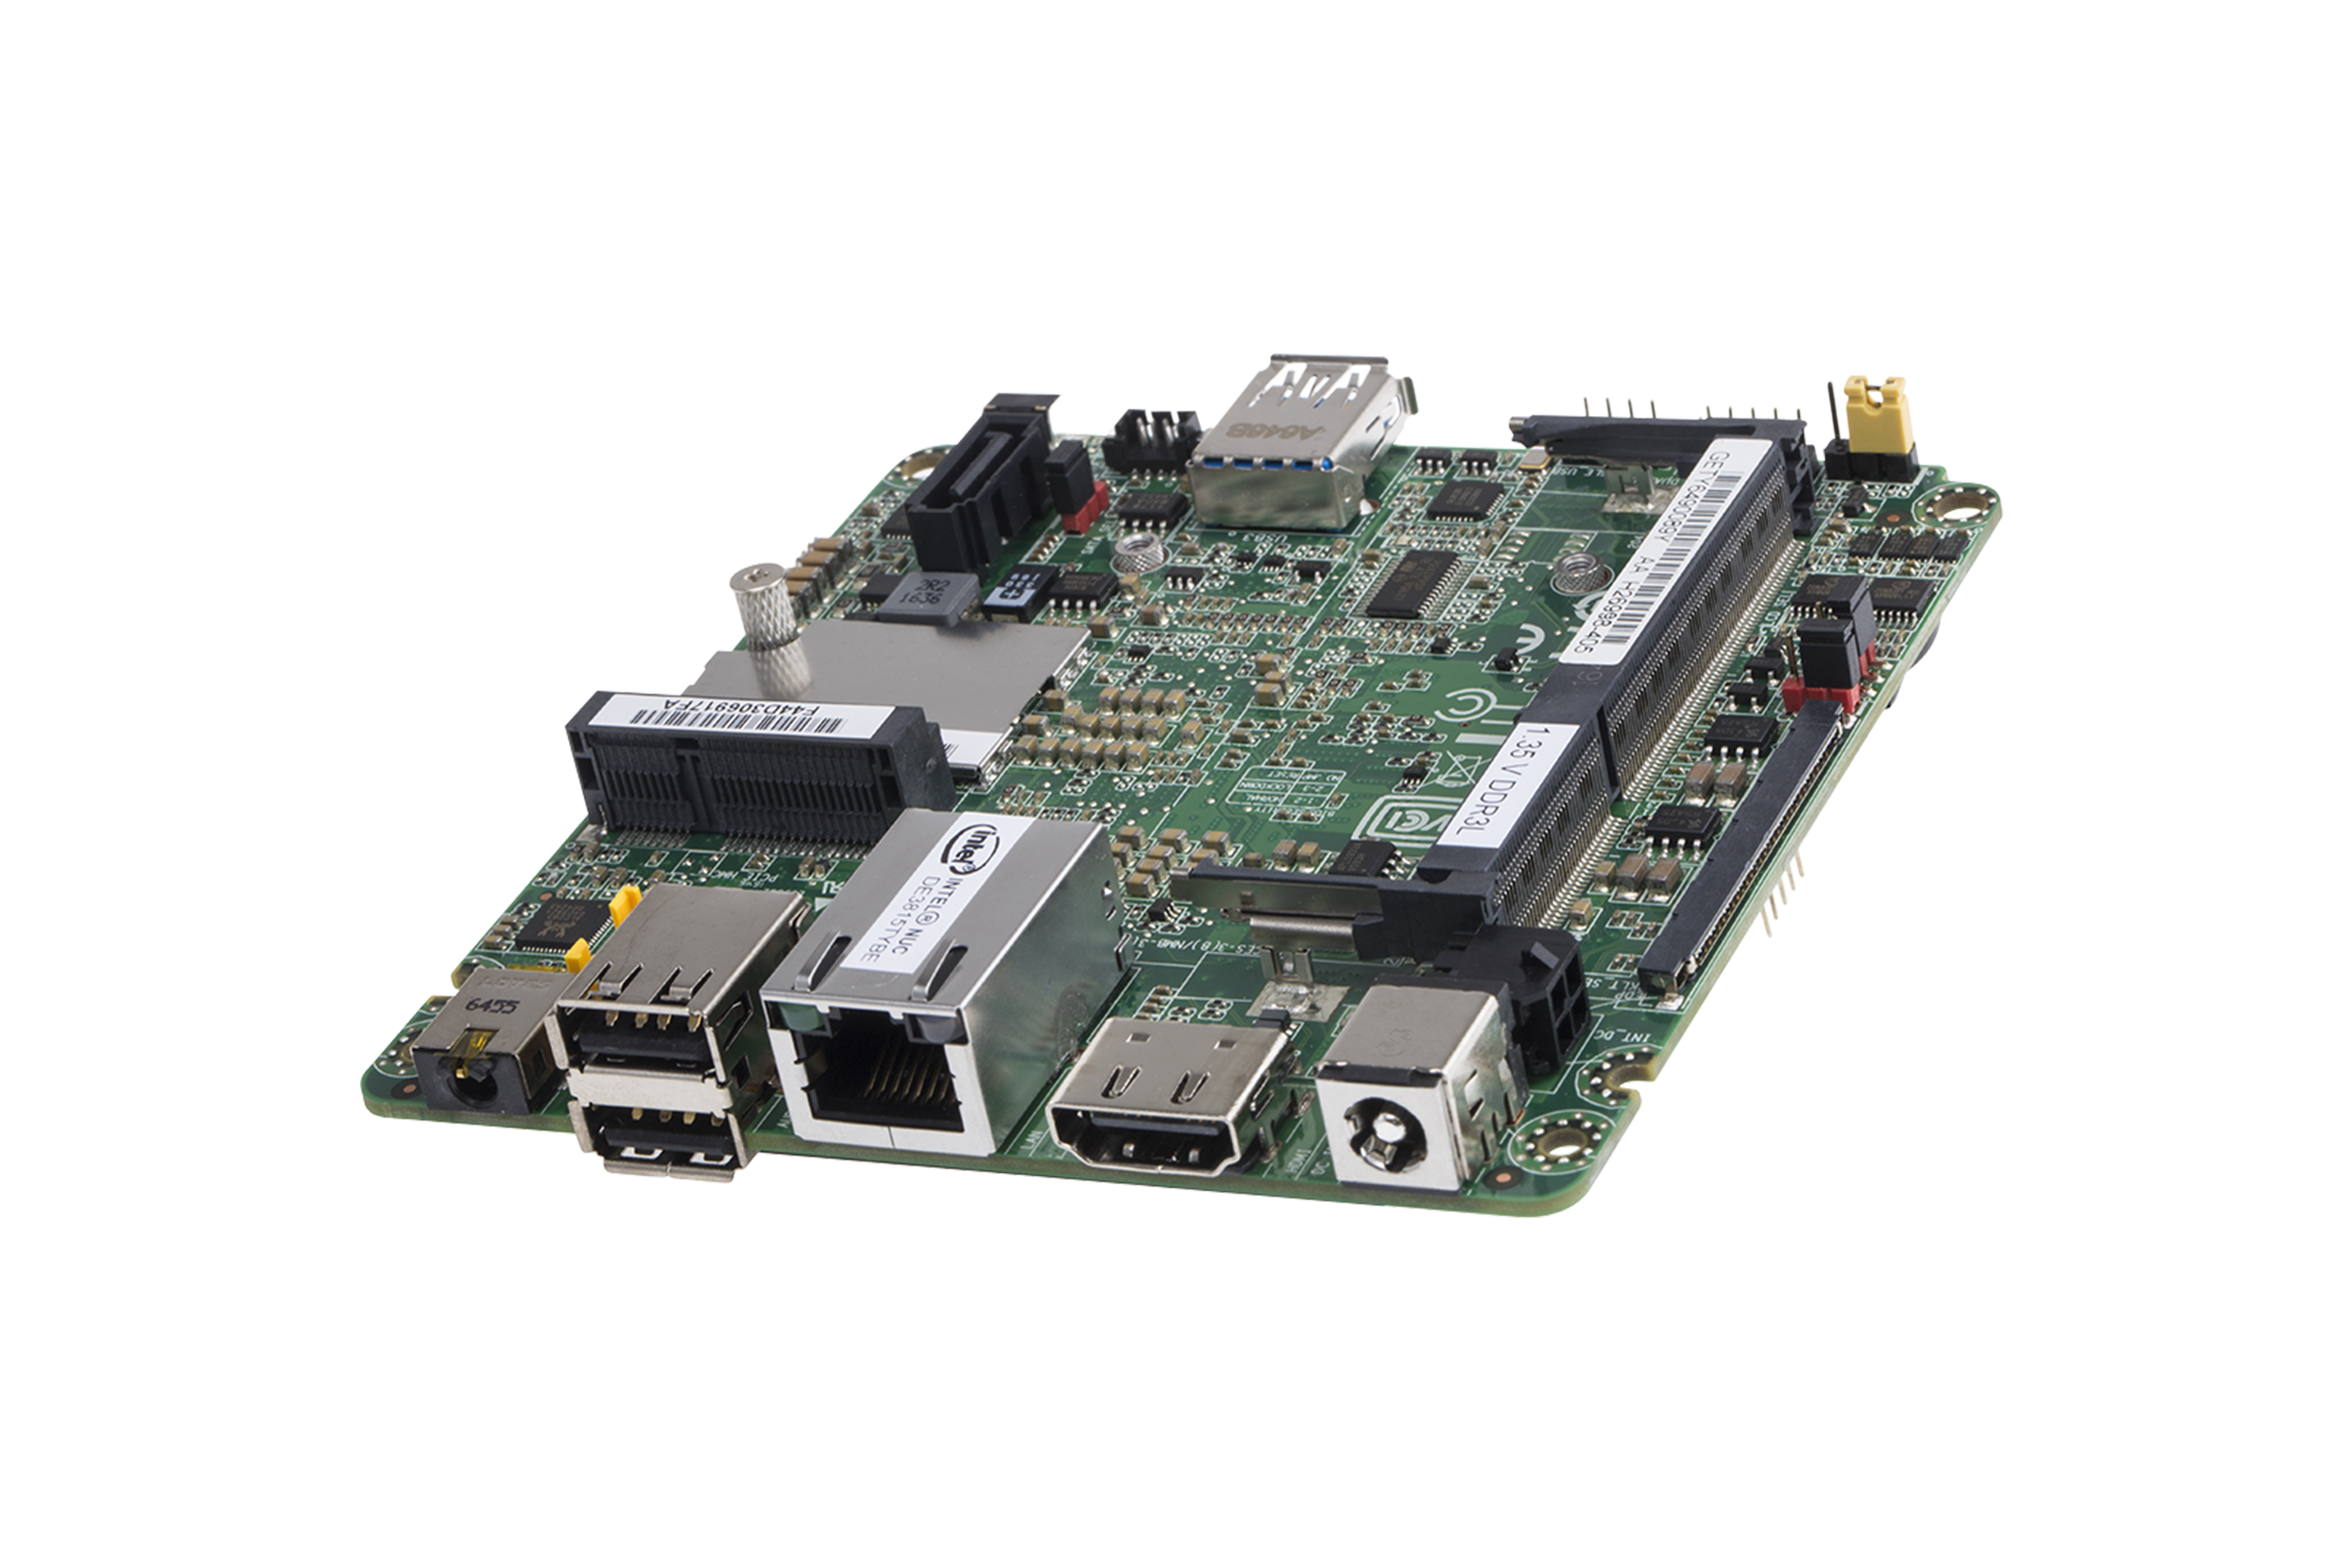 Intel Thin Canyon NUC Atom E3815 1,46 GHz